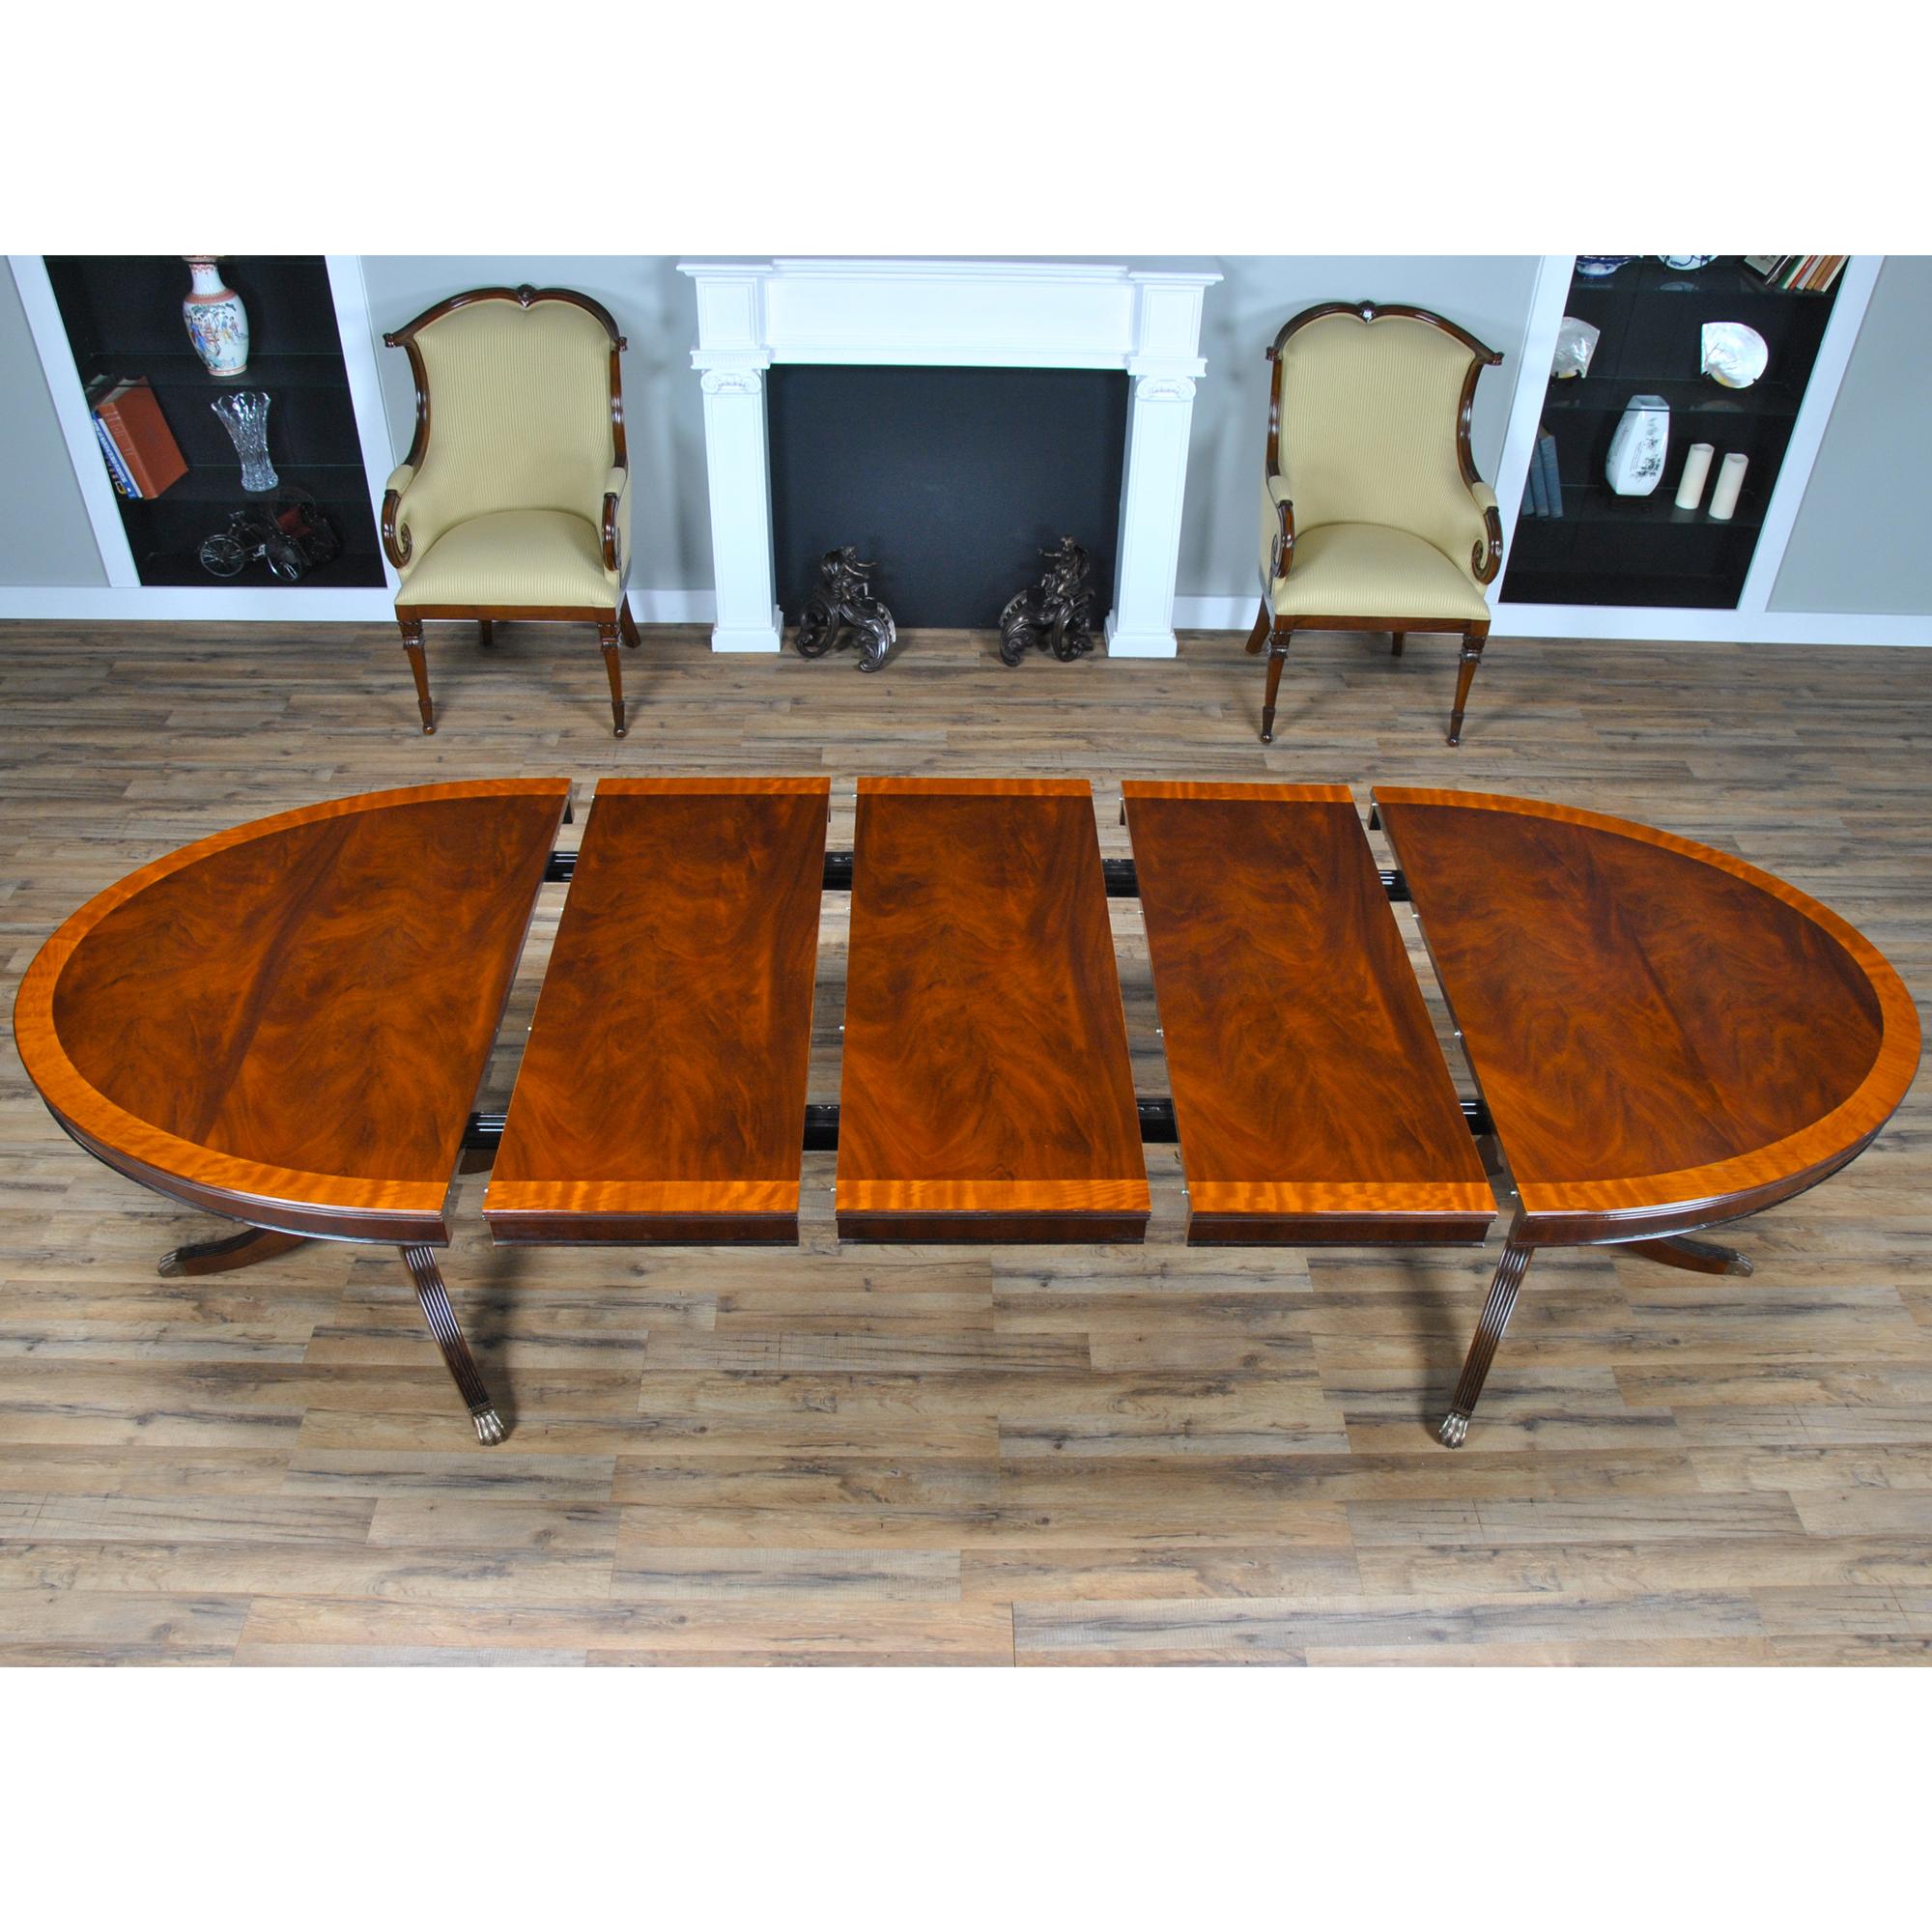 Long Dining Room Tables: DSC_0006